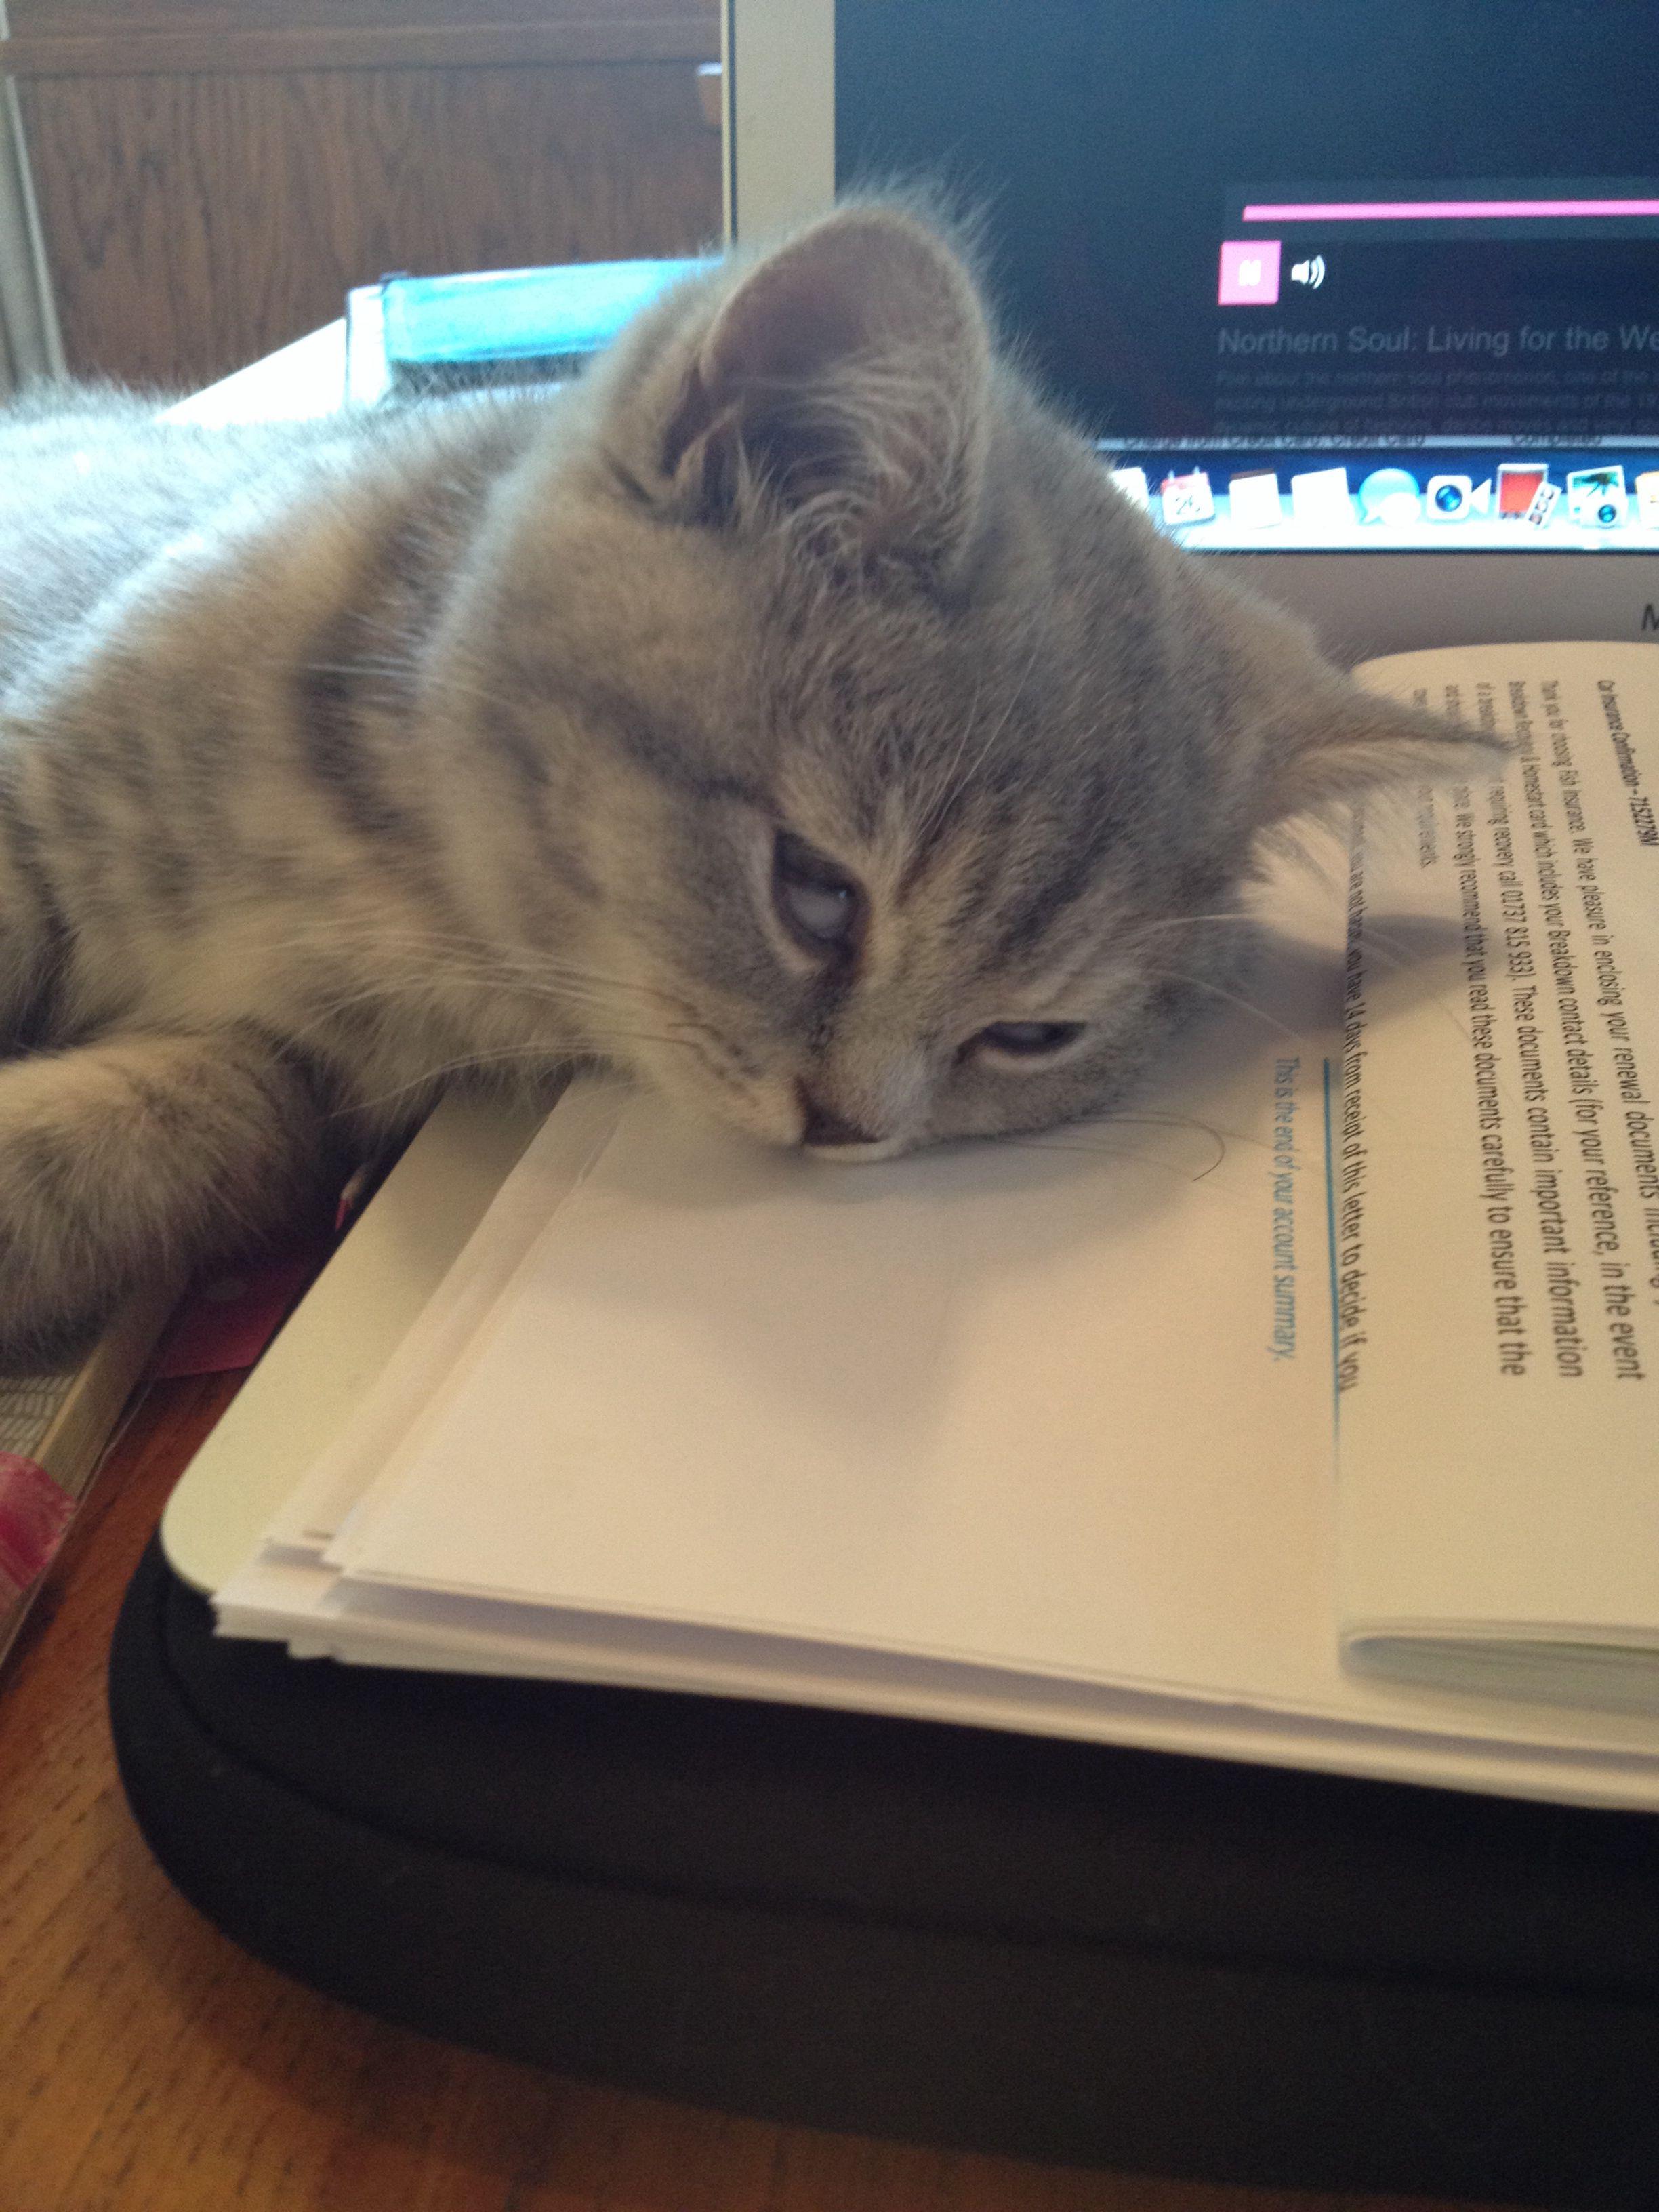 It S My Turn On The Mac Kitten Britishshorthair Queenelsa Cat Hewan Lucu Binatang Lucu Binatang